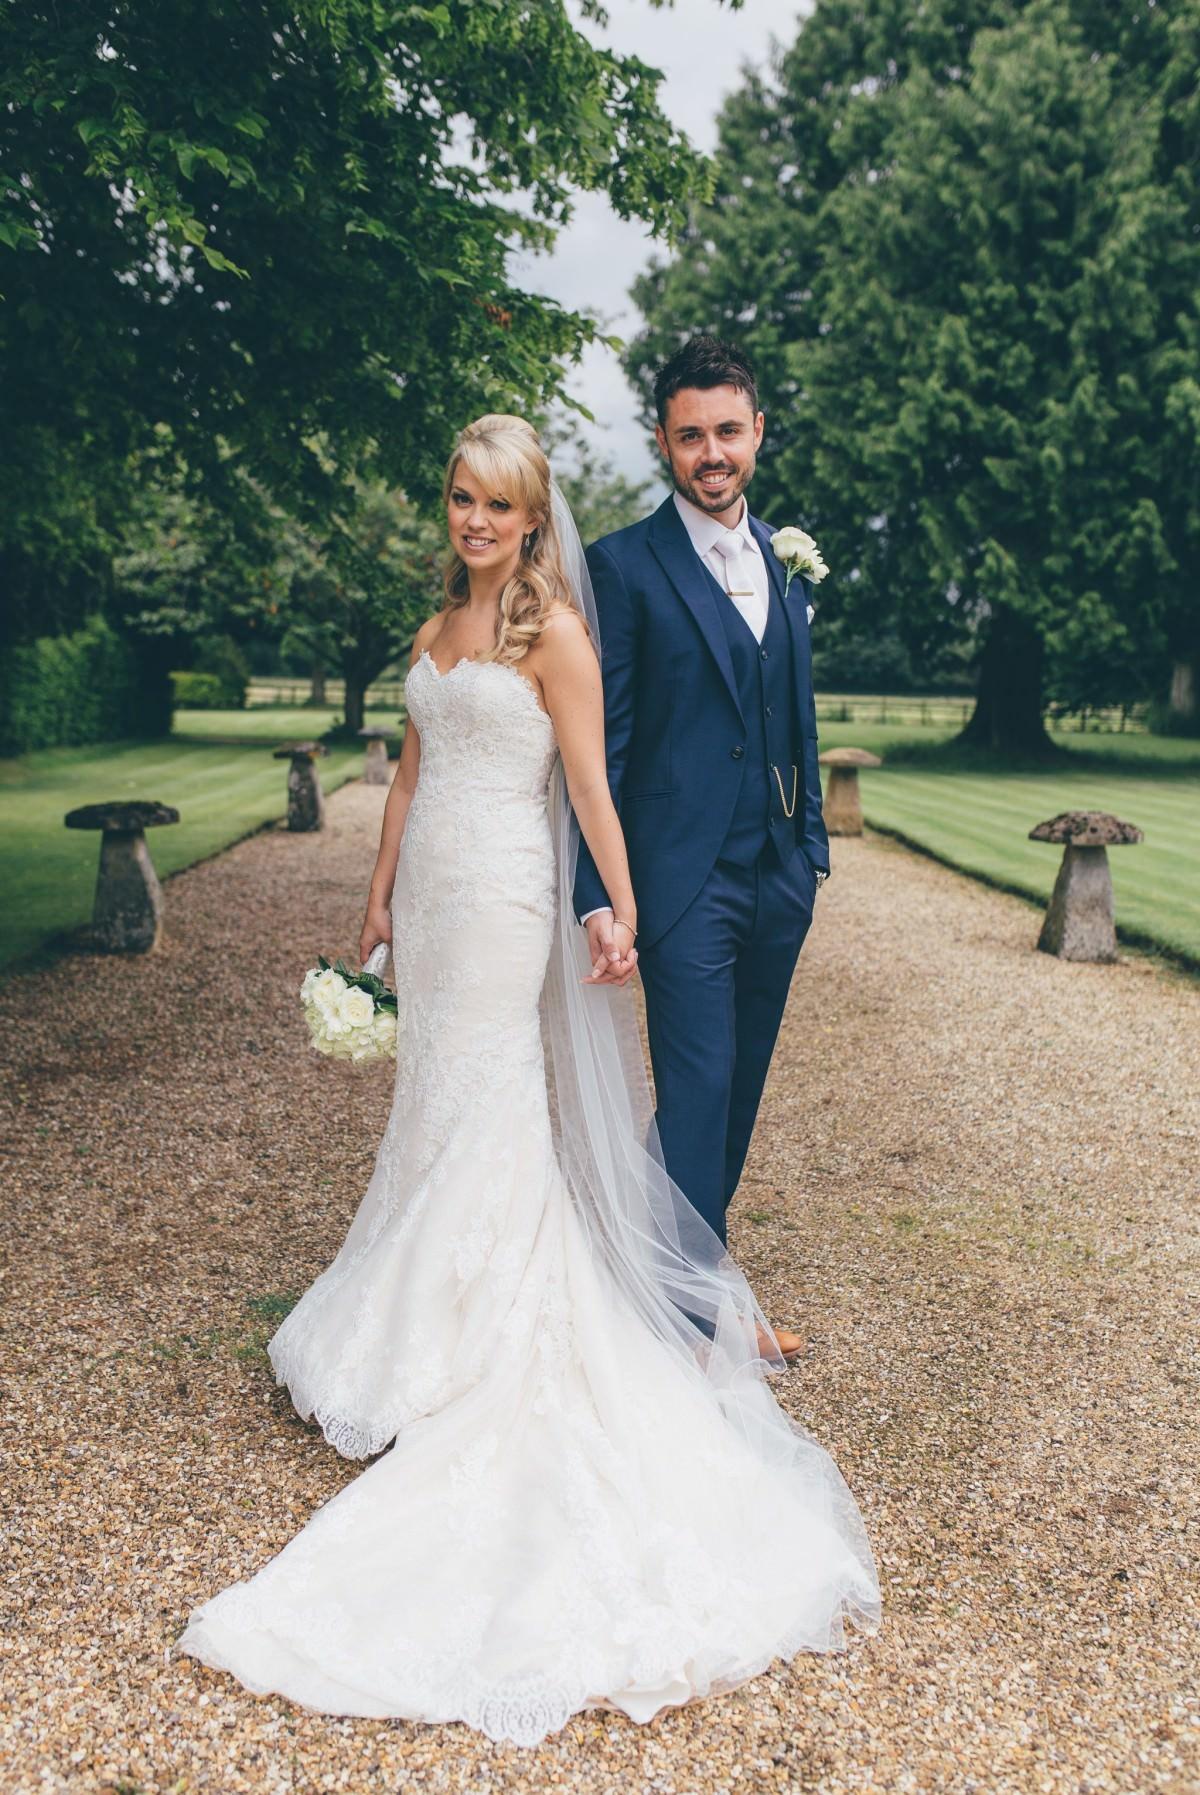 welsh_wedding_photographer_rachel_lambert_photography_lower_slaughter_manor_house_cotswolds_harriet_dean_ 30